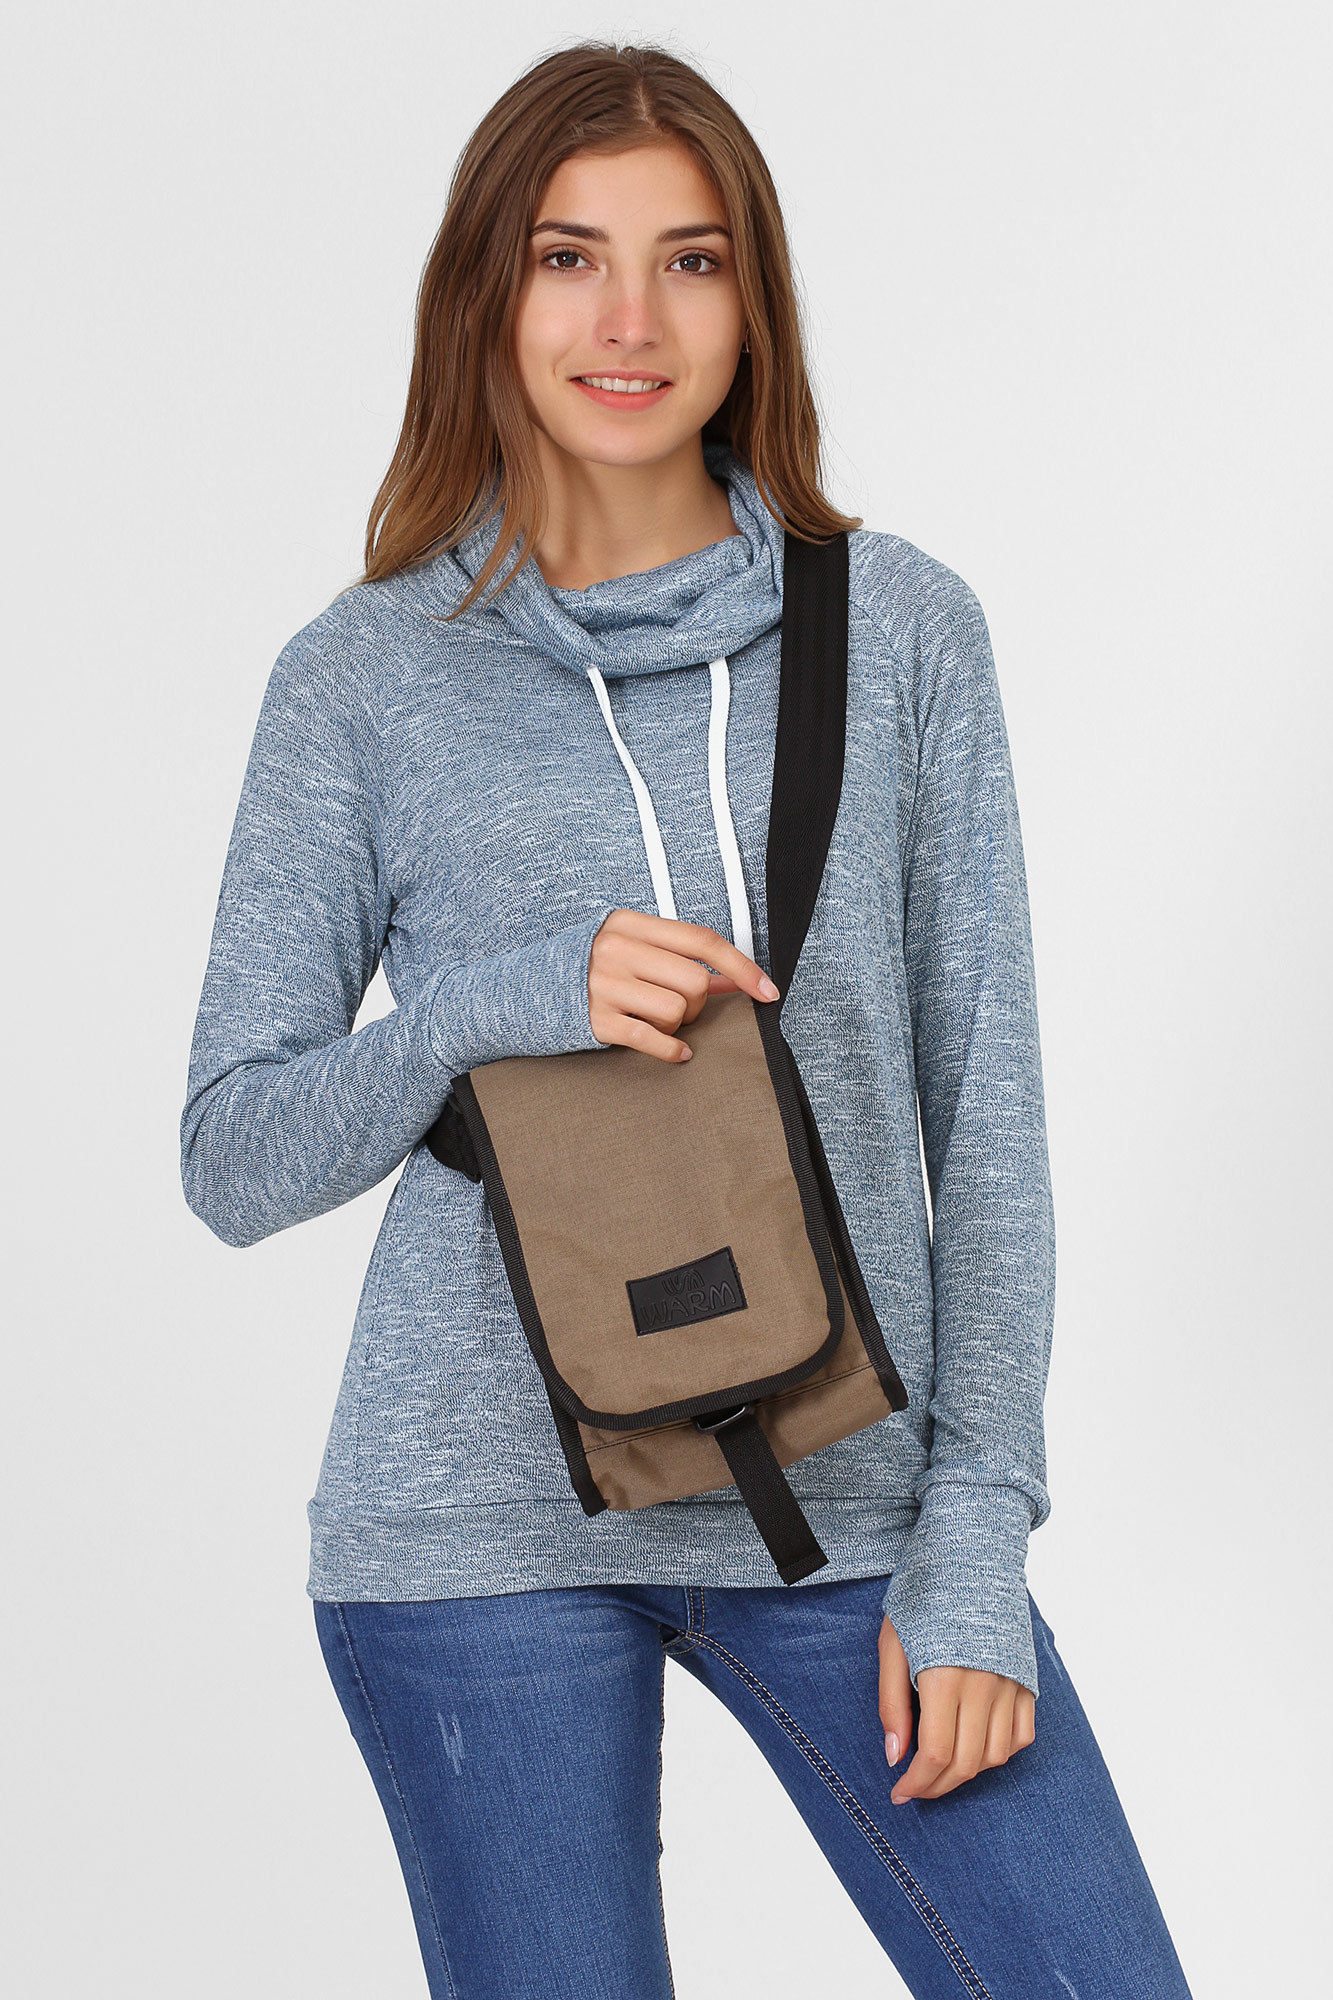 Однотонная сумка Мессенджер на плечо хаки